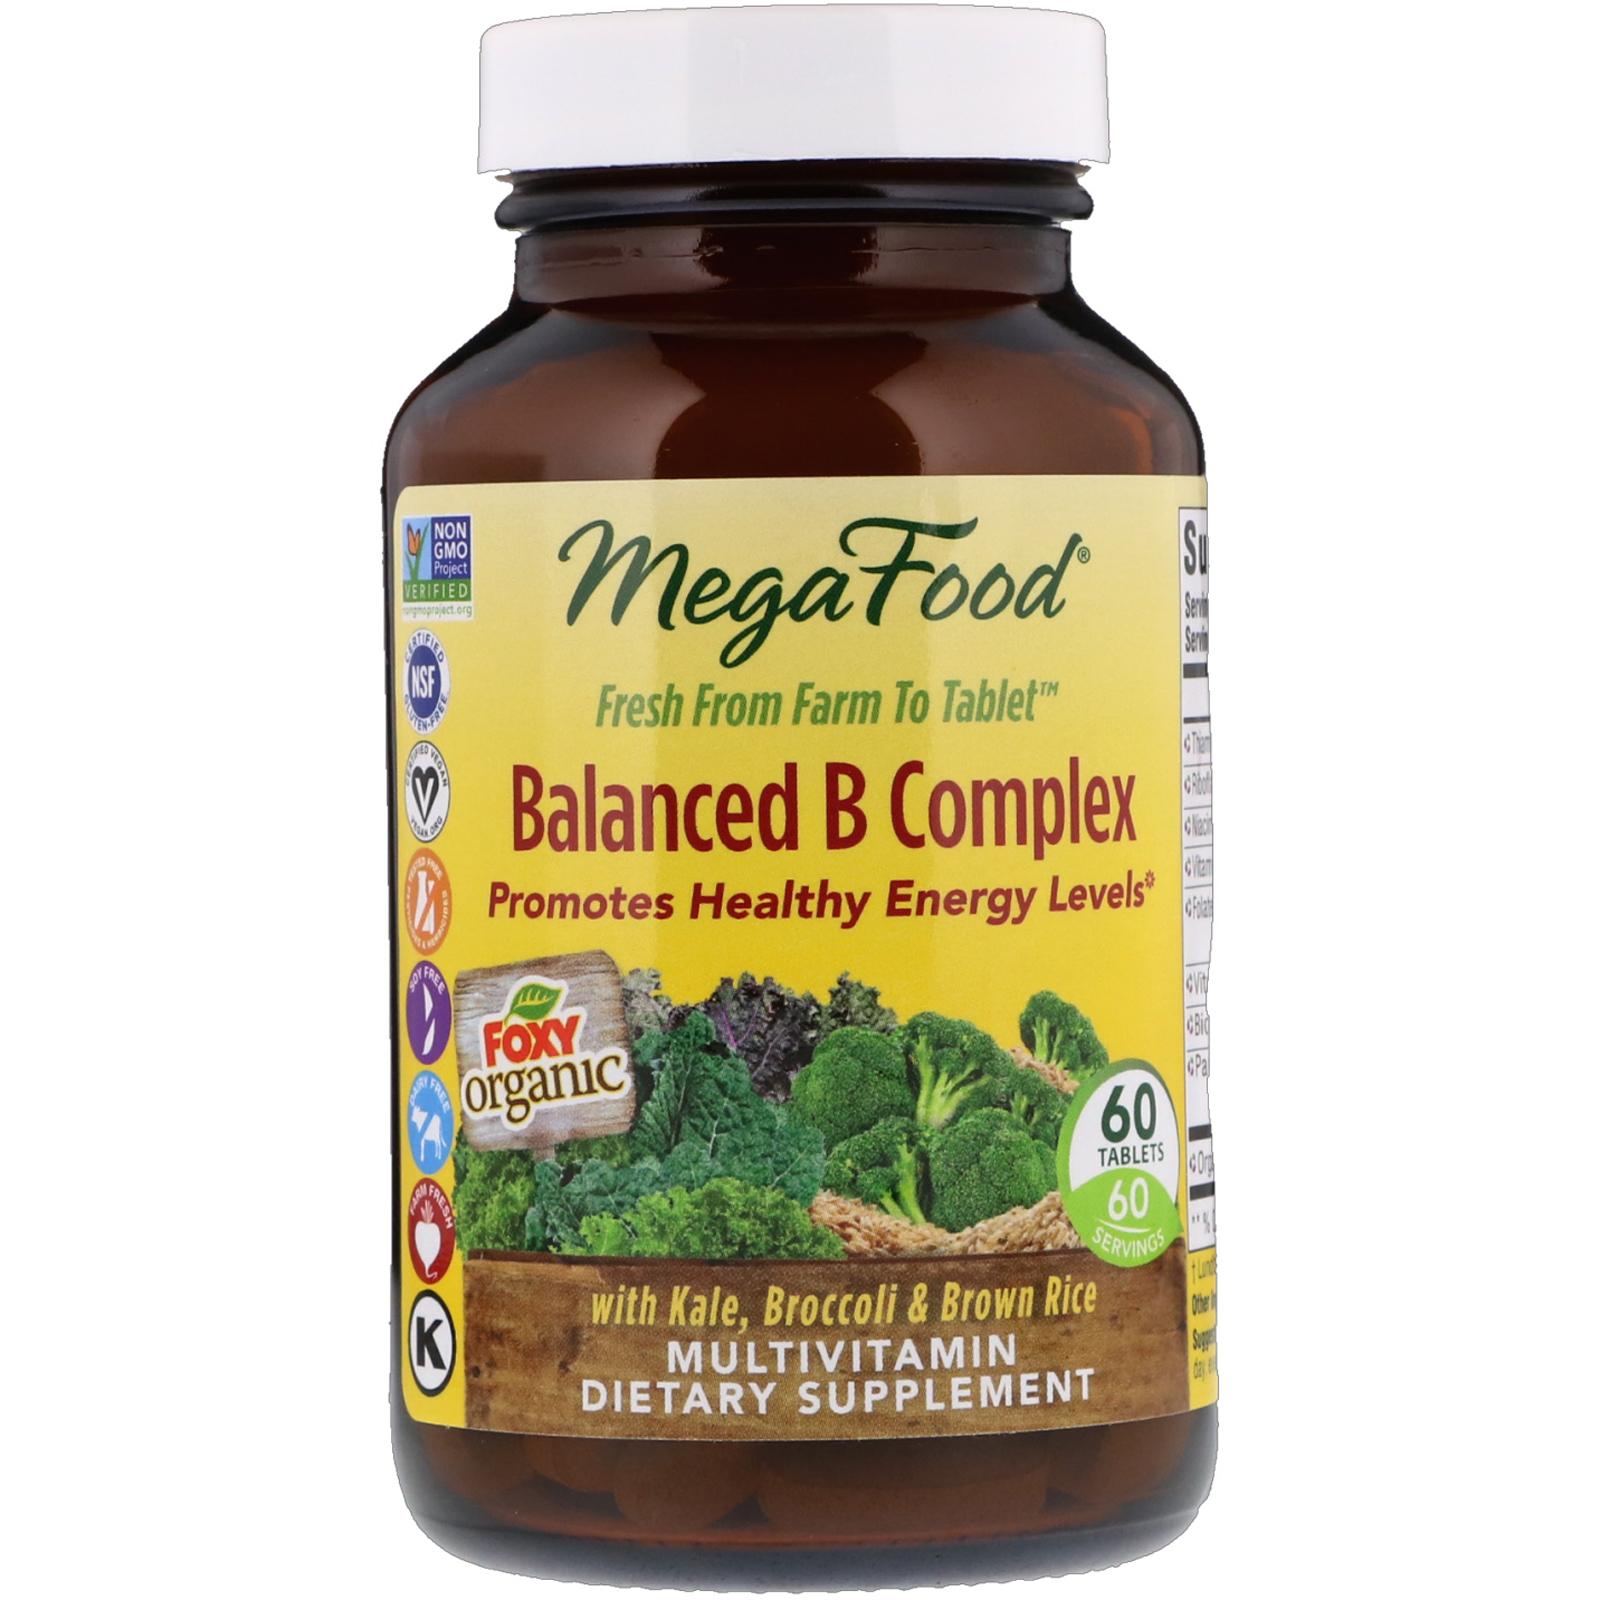 Balanced B Complex - 60 Tablets by MegaFood